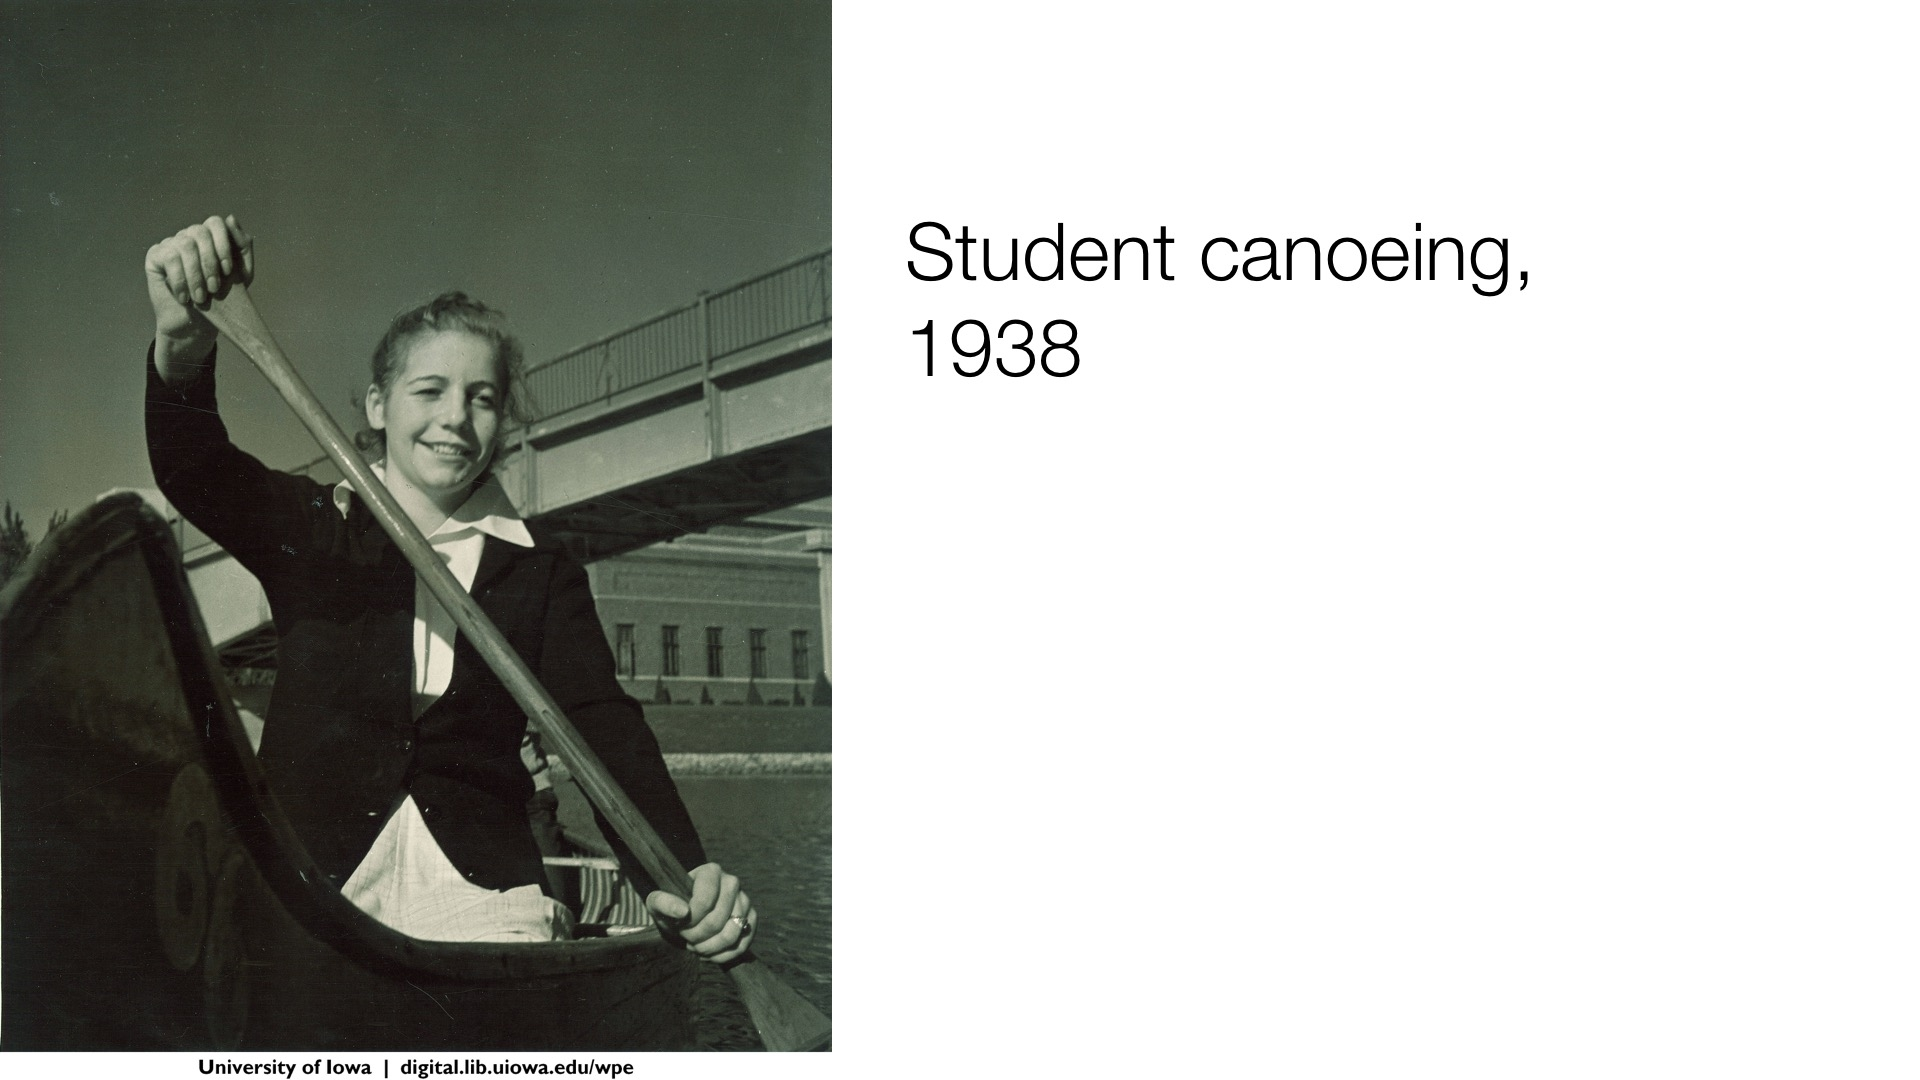 Student canoeing, 1938